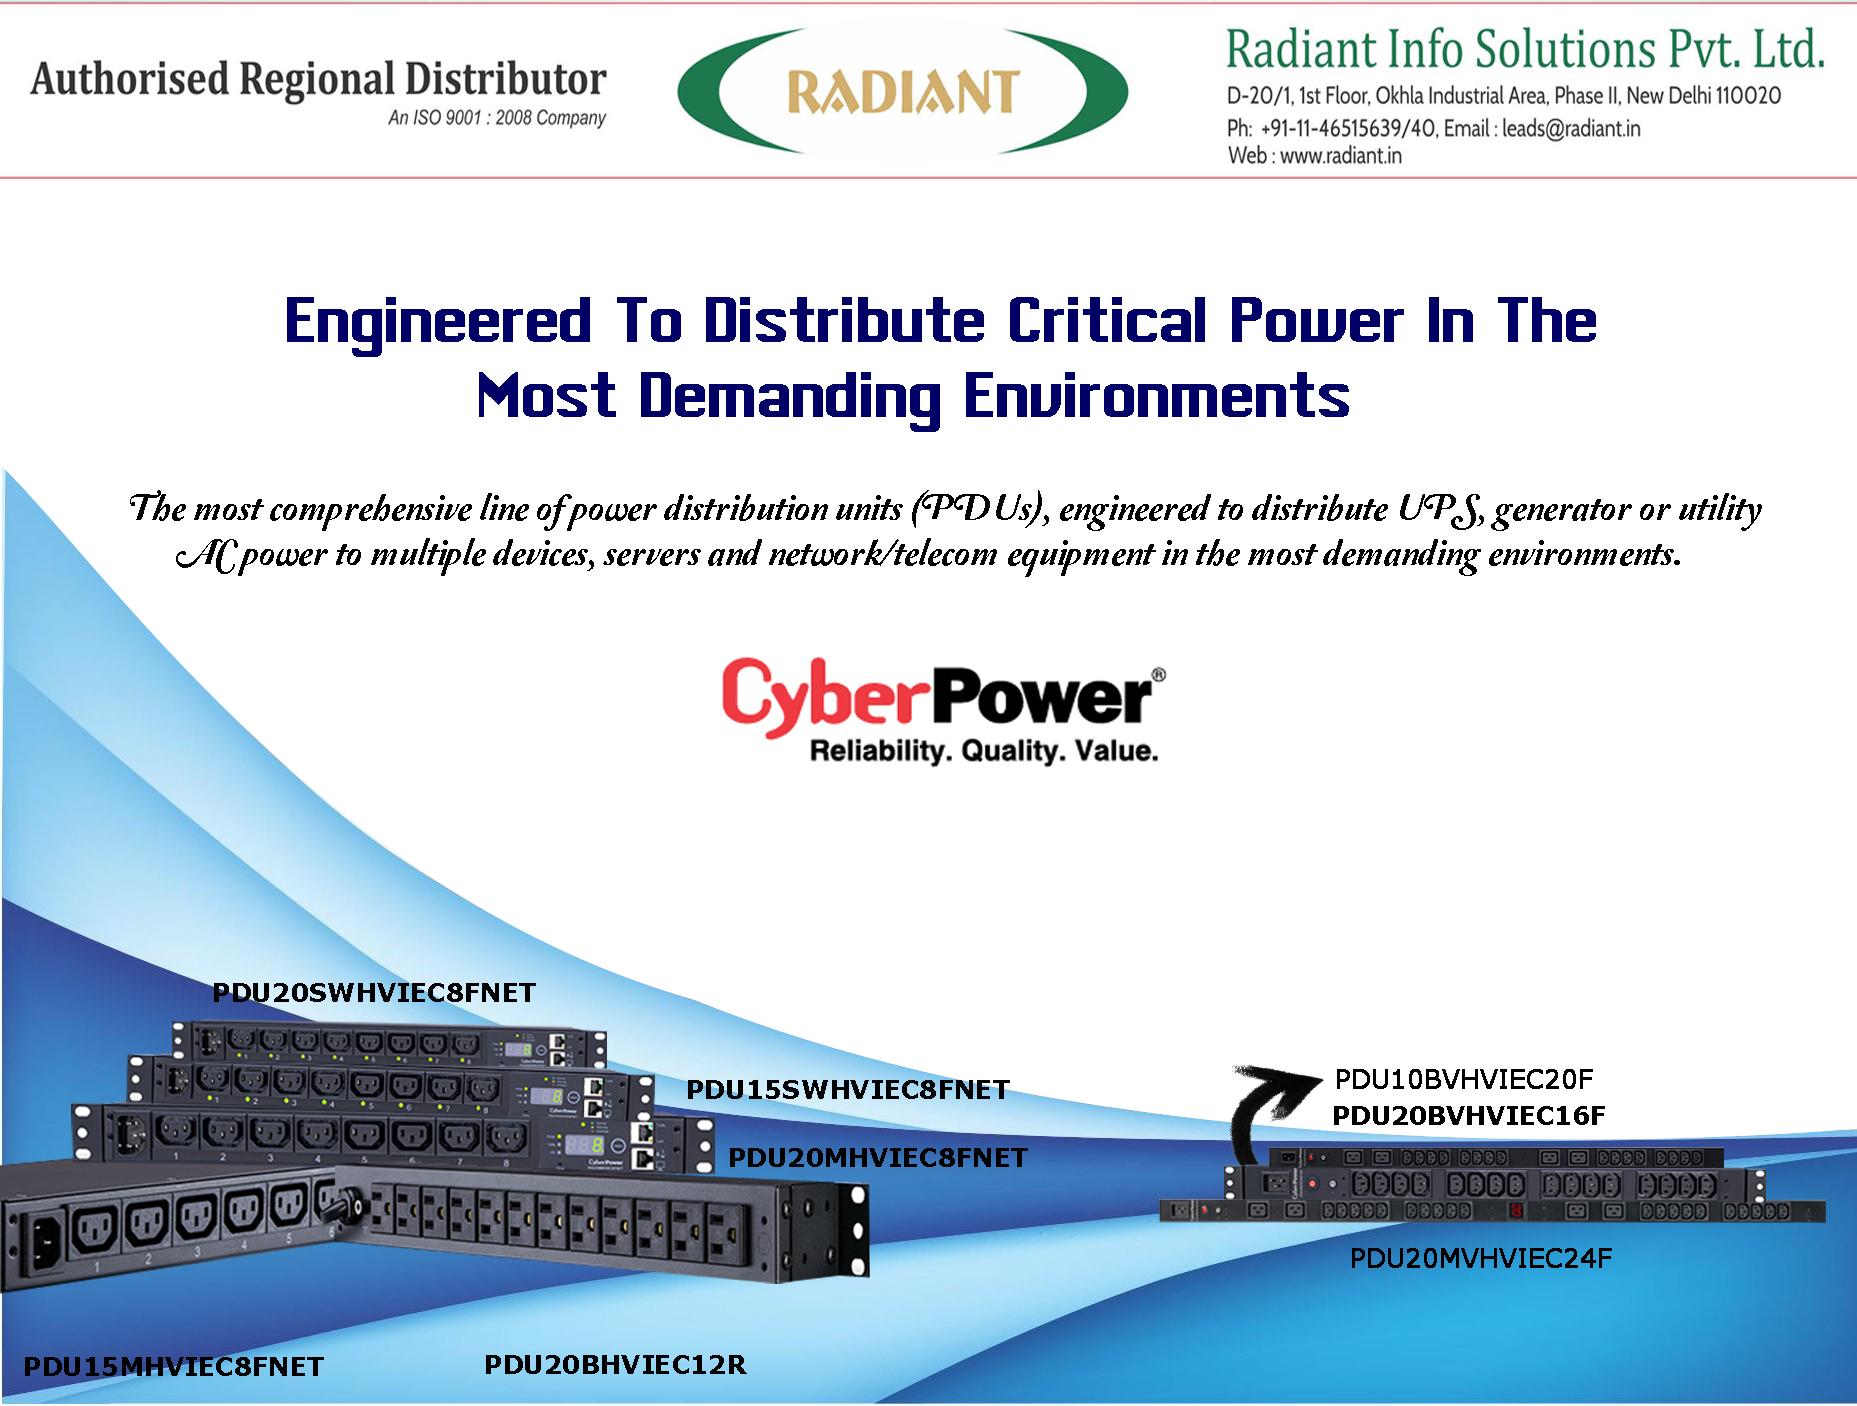 cyberpower edm123-BLUEE